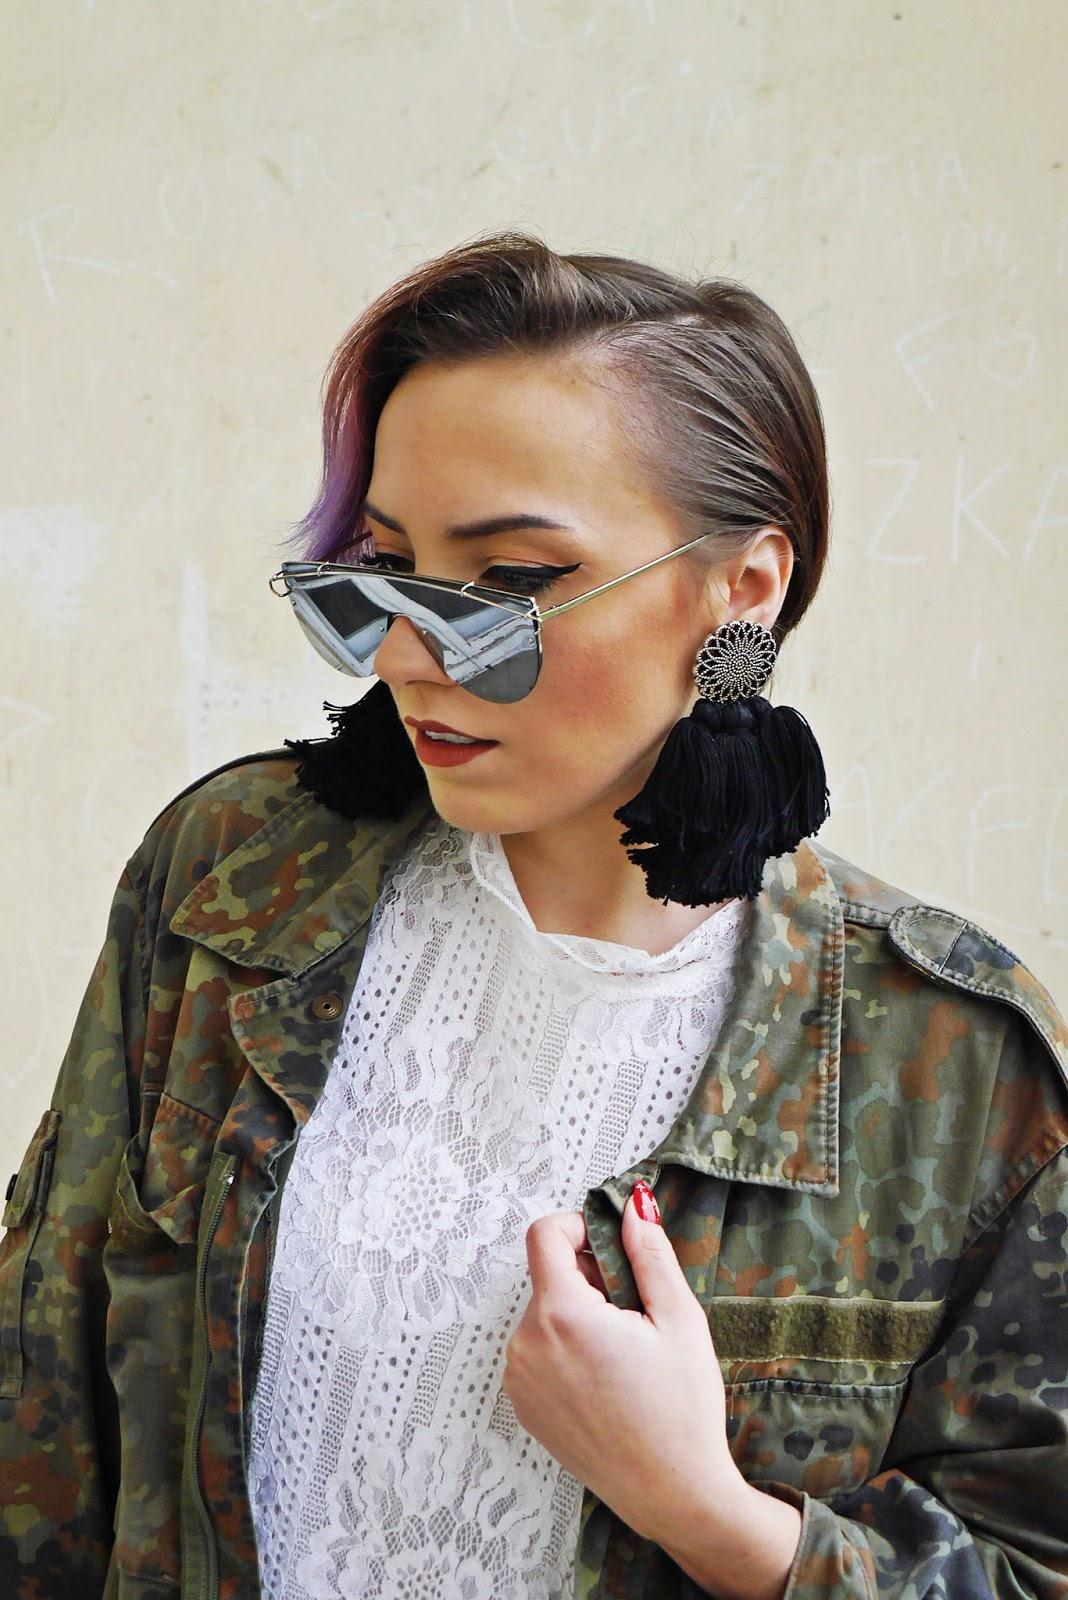 6_moro_kurtka_sh_koronkowa_biala_sukienka_karyn_blog_buty_renee_031217a